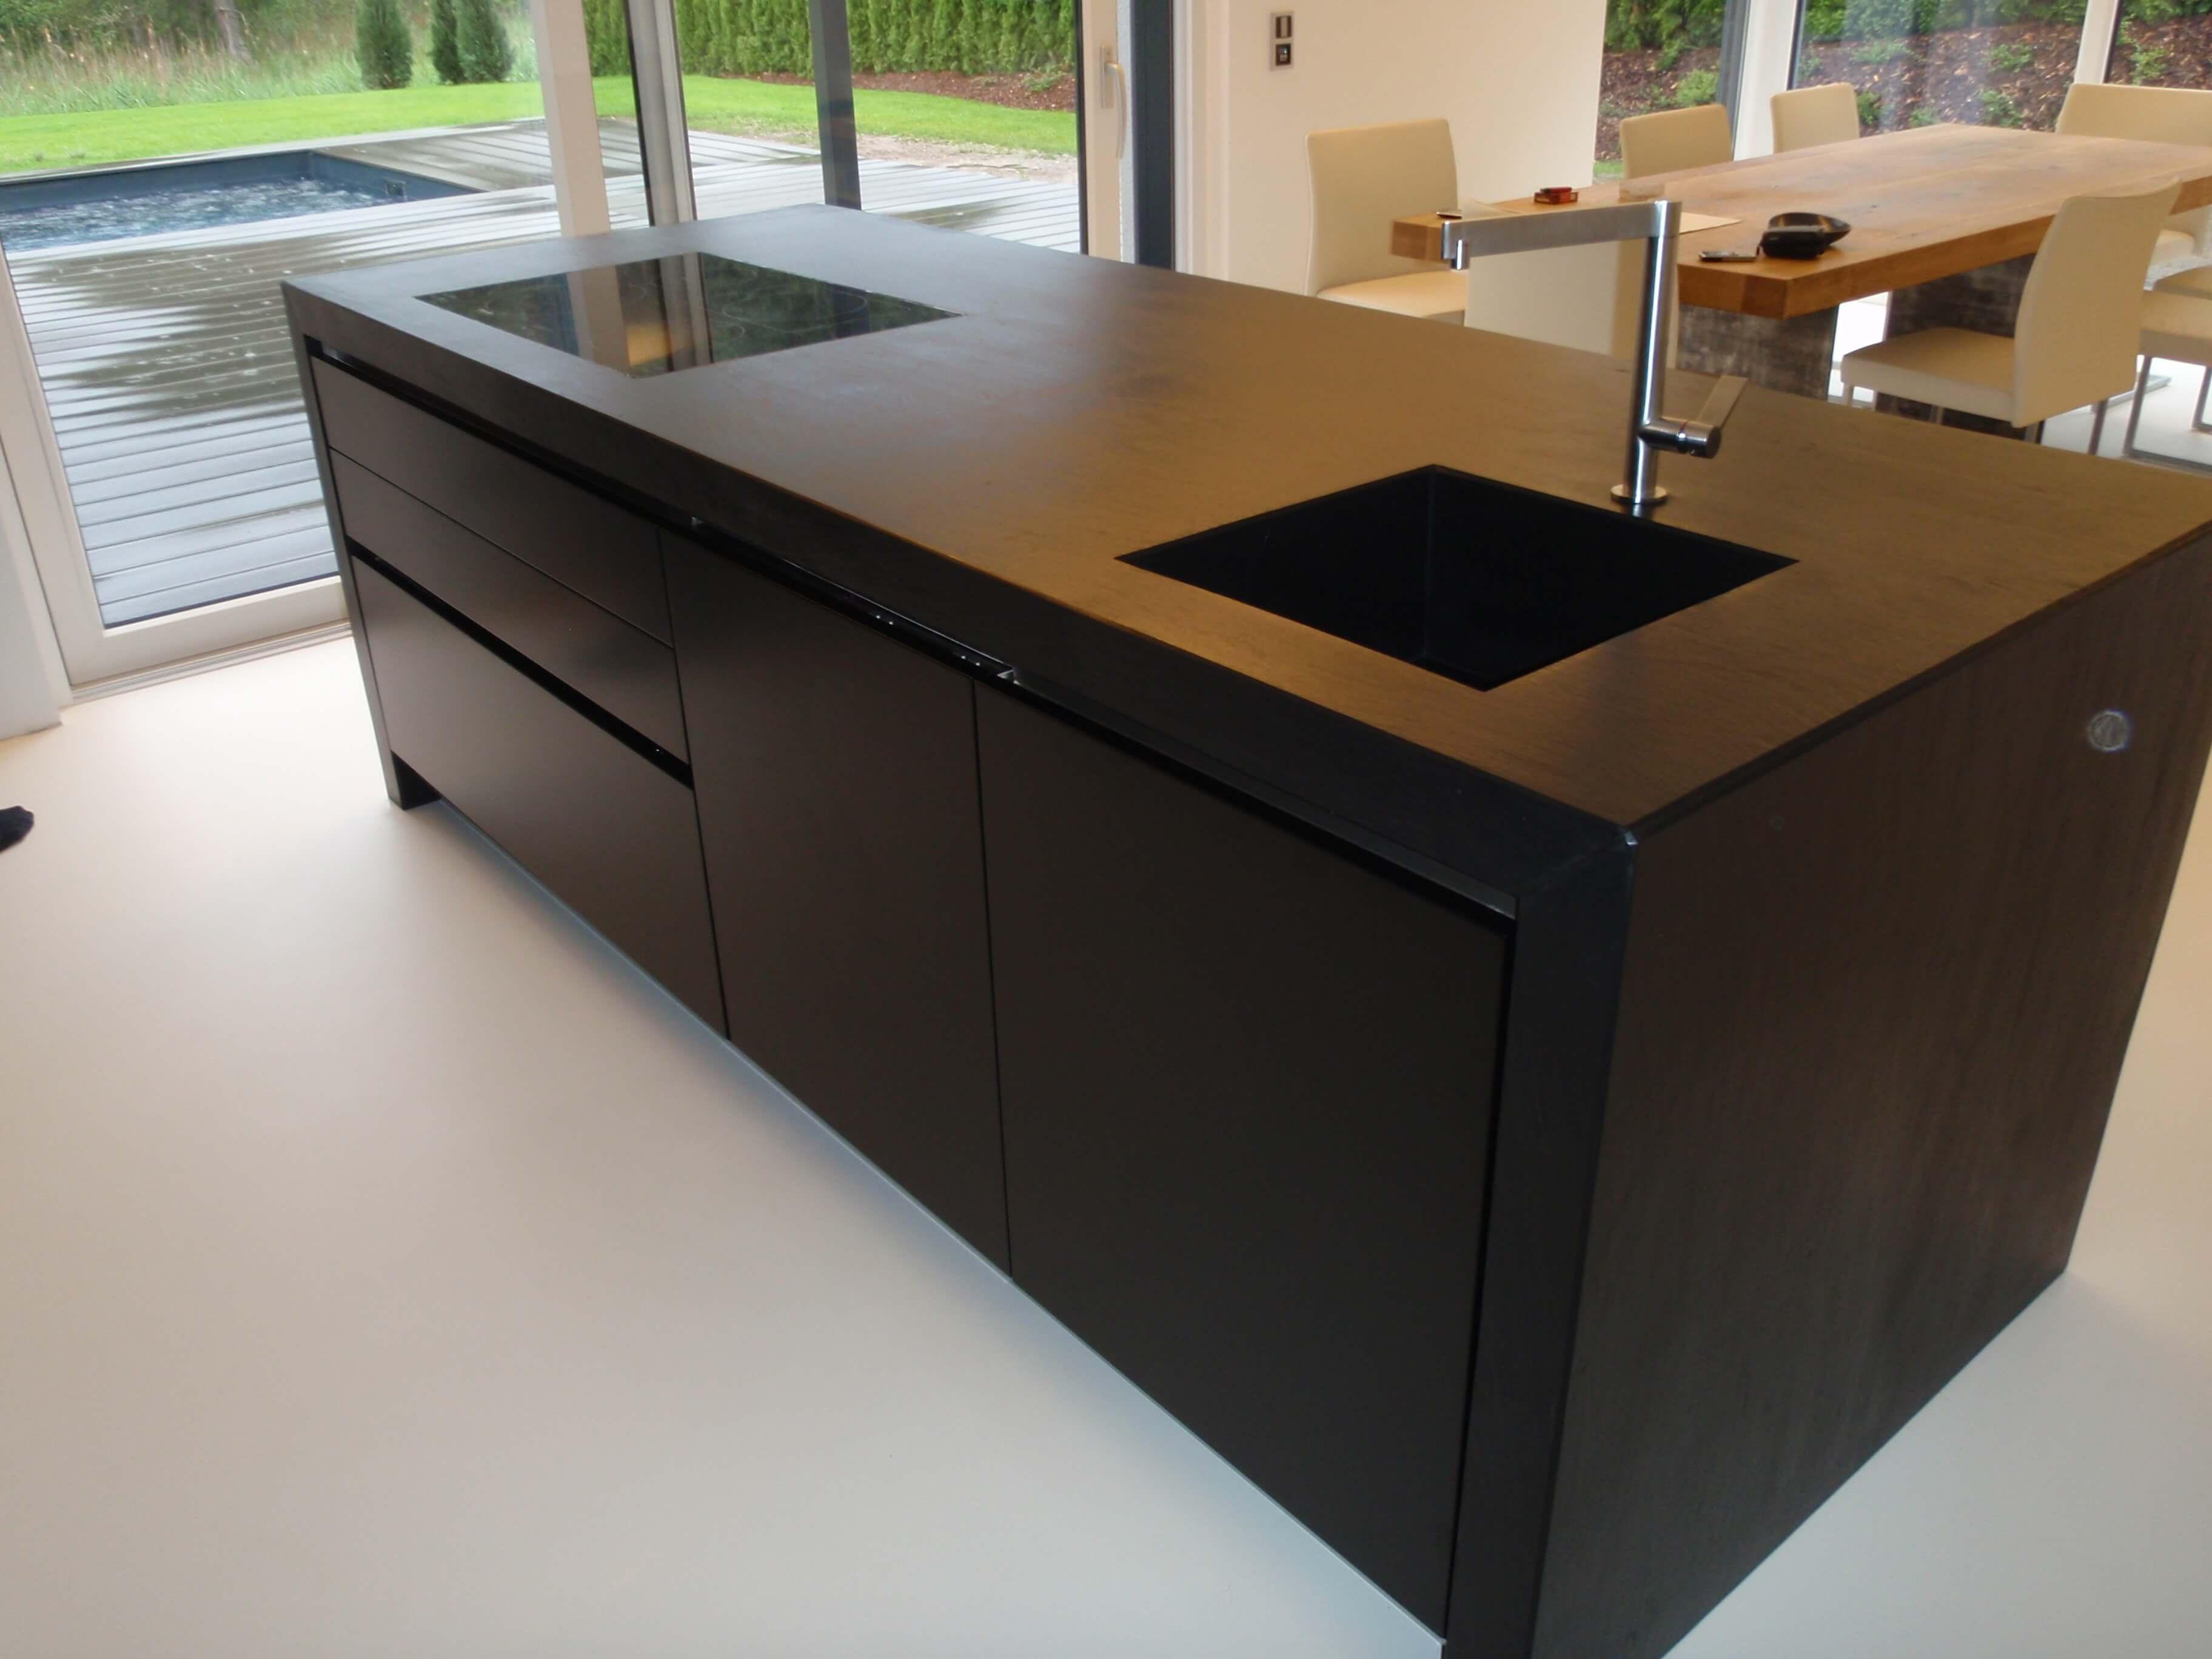 k chenarbeitsplatten stein design winkler villach. Black Bedroom Furniture Sets. Home Design Ideas